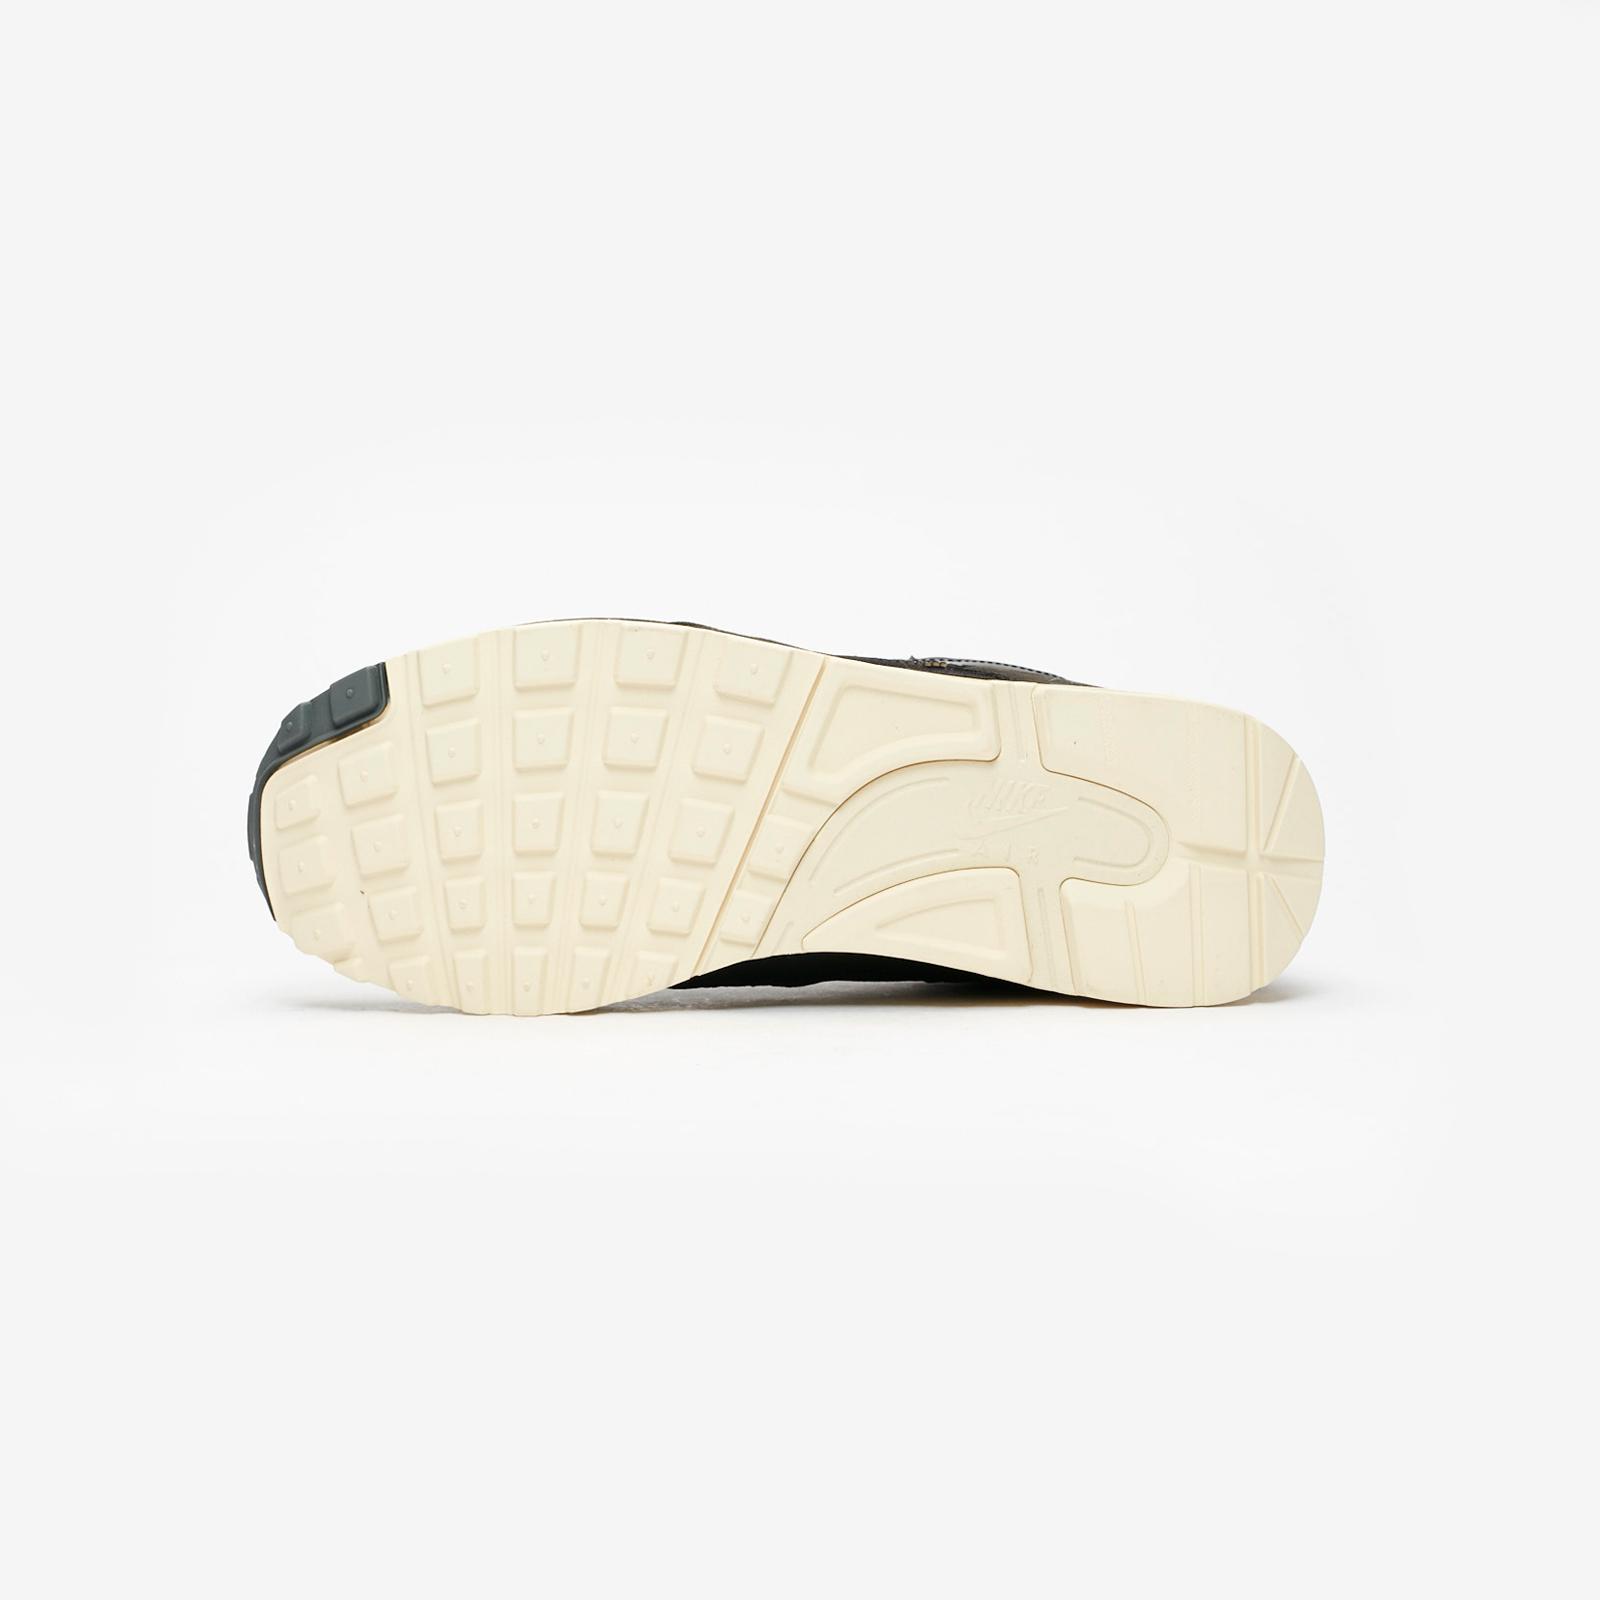 quality design 7e50a 84fac Nike Sportswear Air Skylon II   Fear Of God - 7. Close